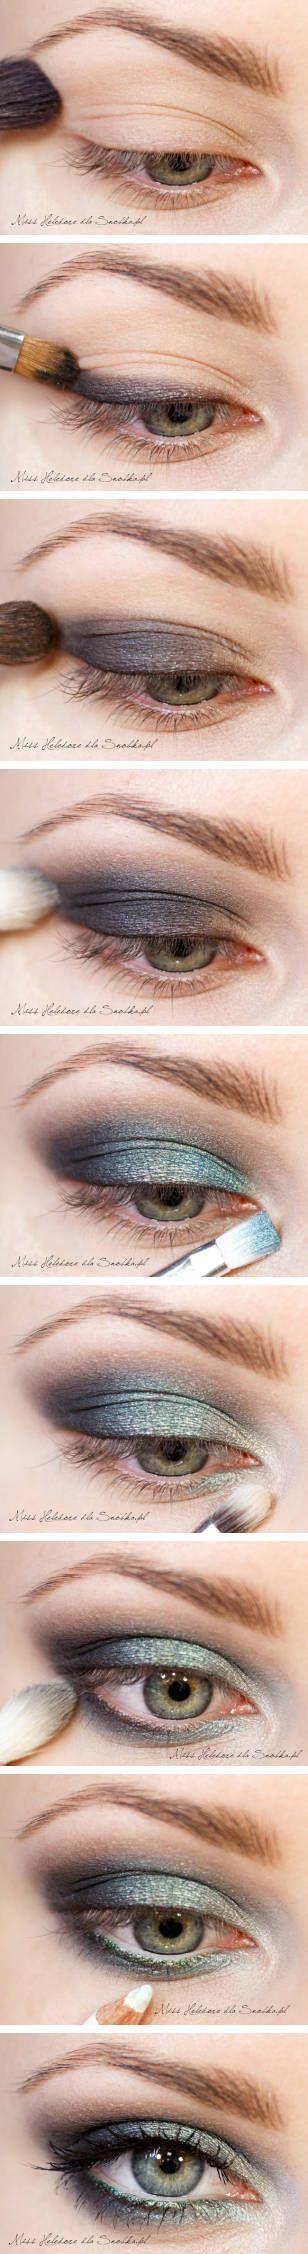 Eye Makeup : Turquoise Dragon